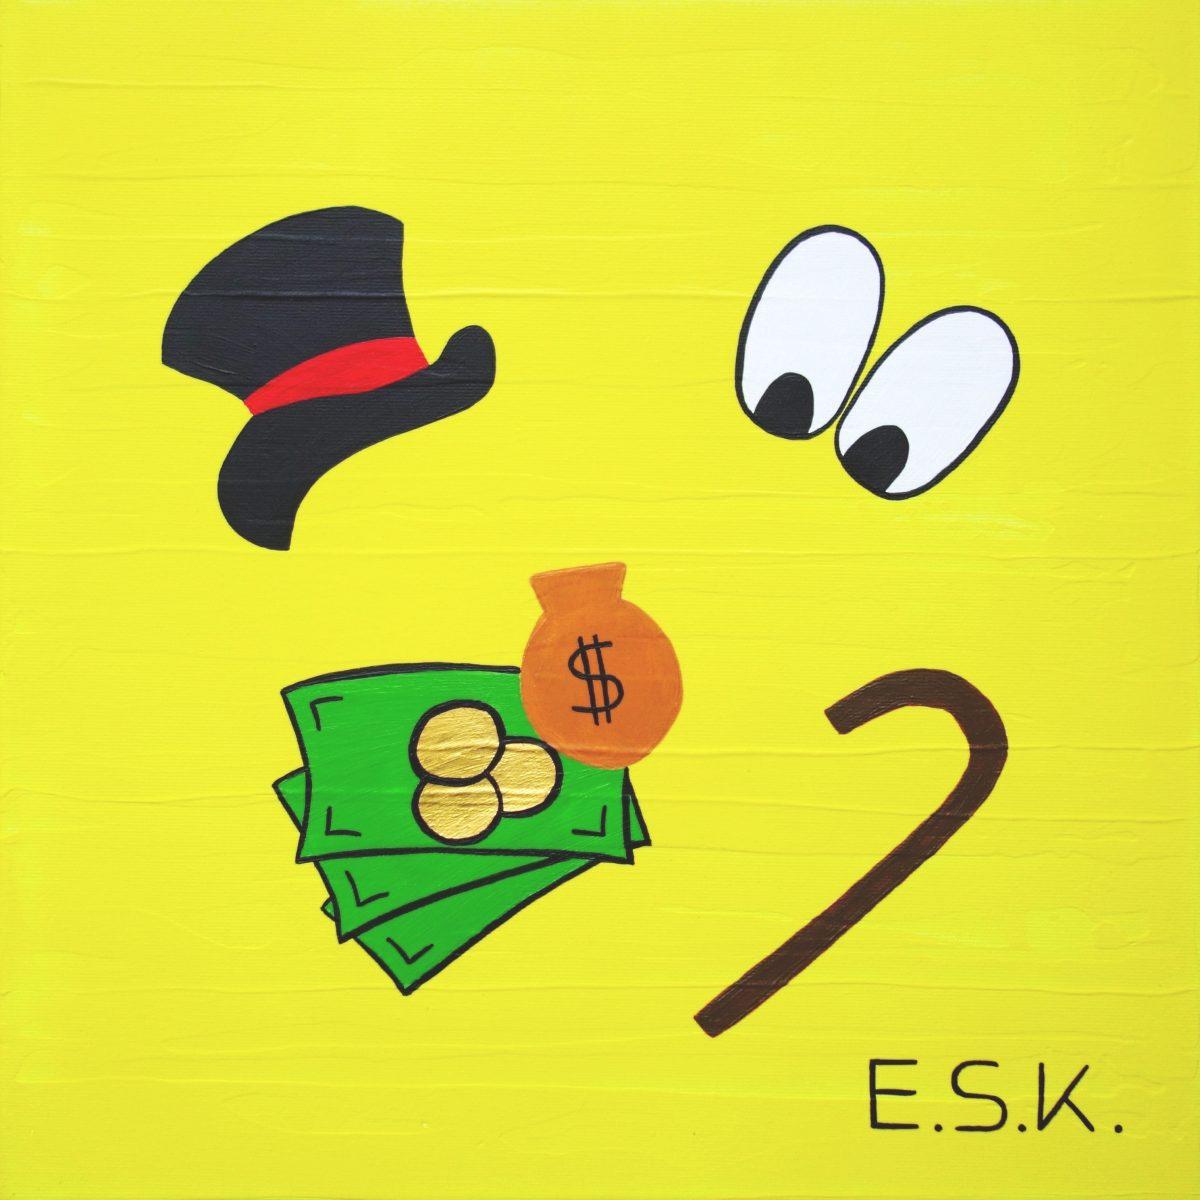 Scrooge McDuck Pop Art by E.S.K. Eileen Susanne Kreipl